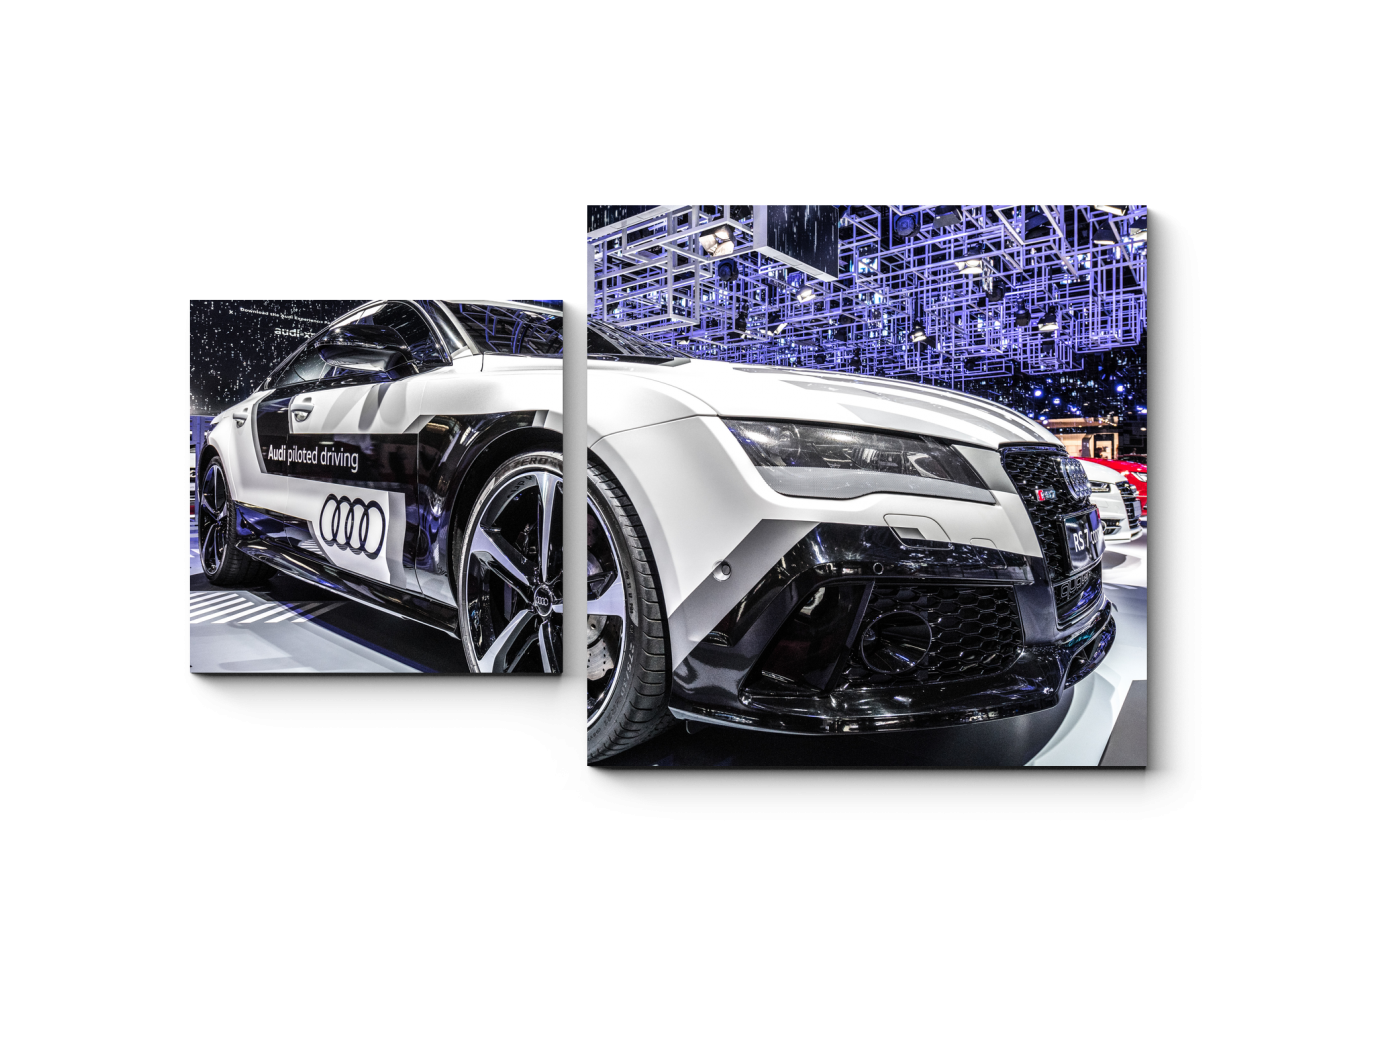 Модульная картина Audi S7 в Париже (50x30) фото